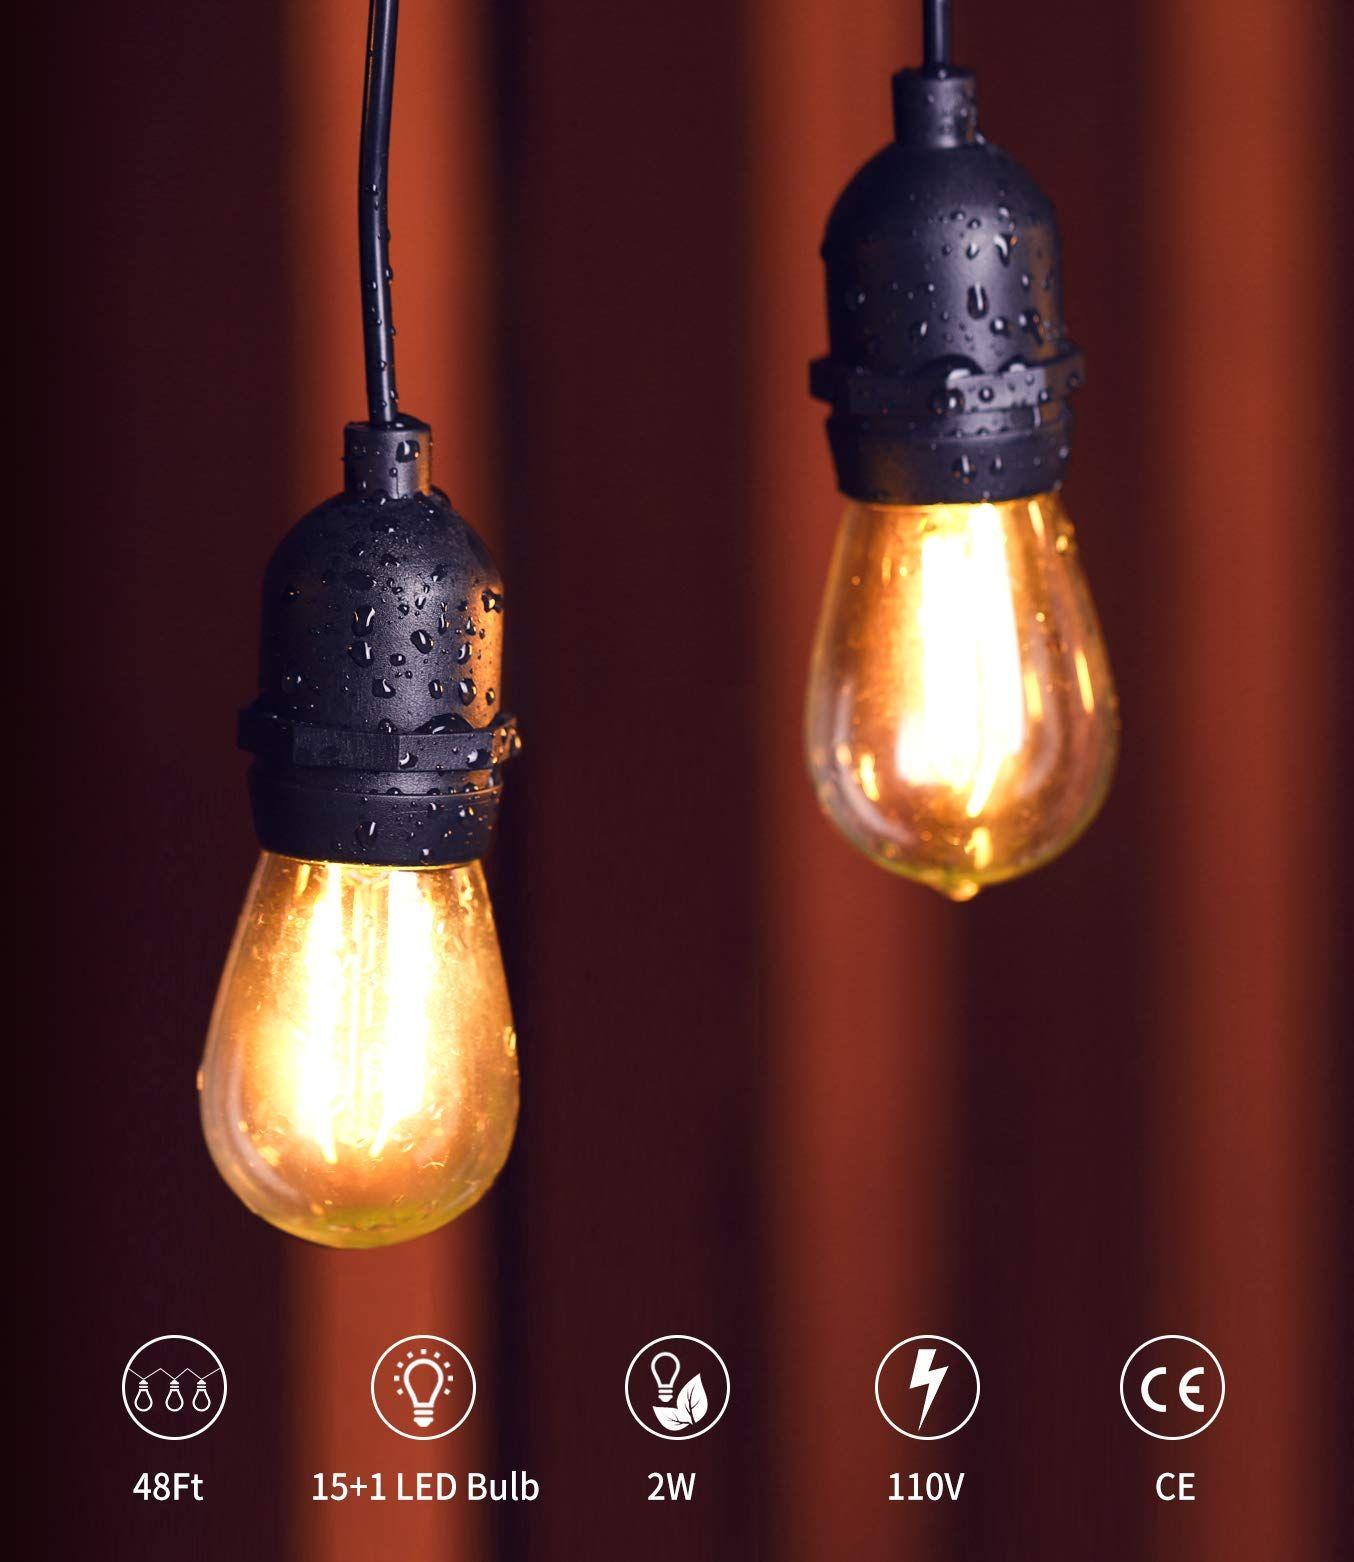 a09e414b1b0b4d434024dda9812e1c3e - Better Homes & Gardens 16 Foot Daylight Led Rope Light